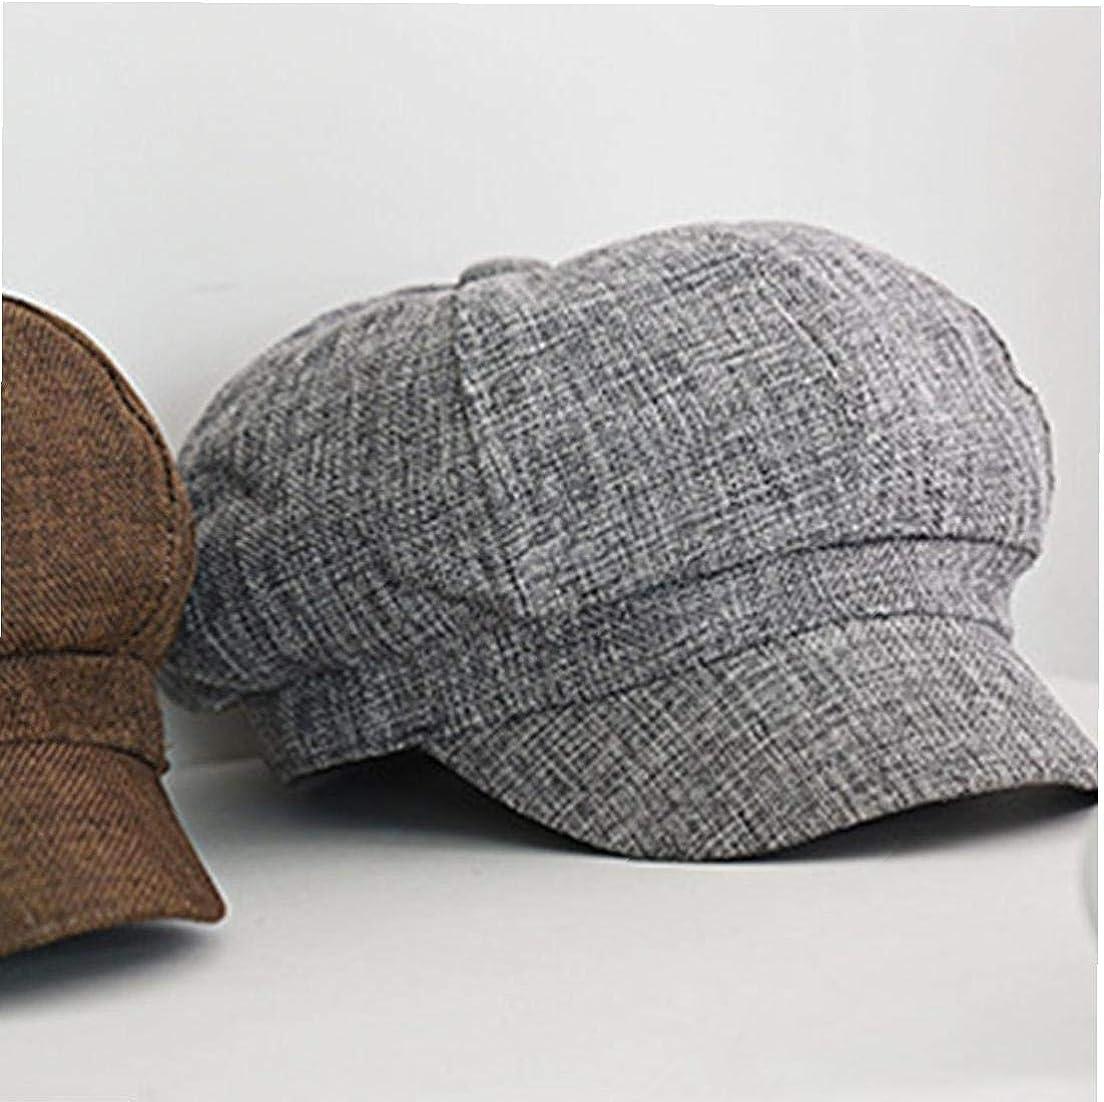 Bongles Women Cotton Linen Beret Caps Newsboy Hat Visor Hat Outdoor Sun Breathable Flat Hats